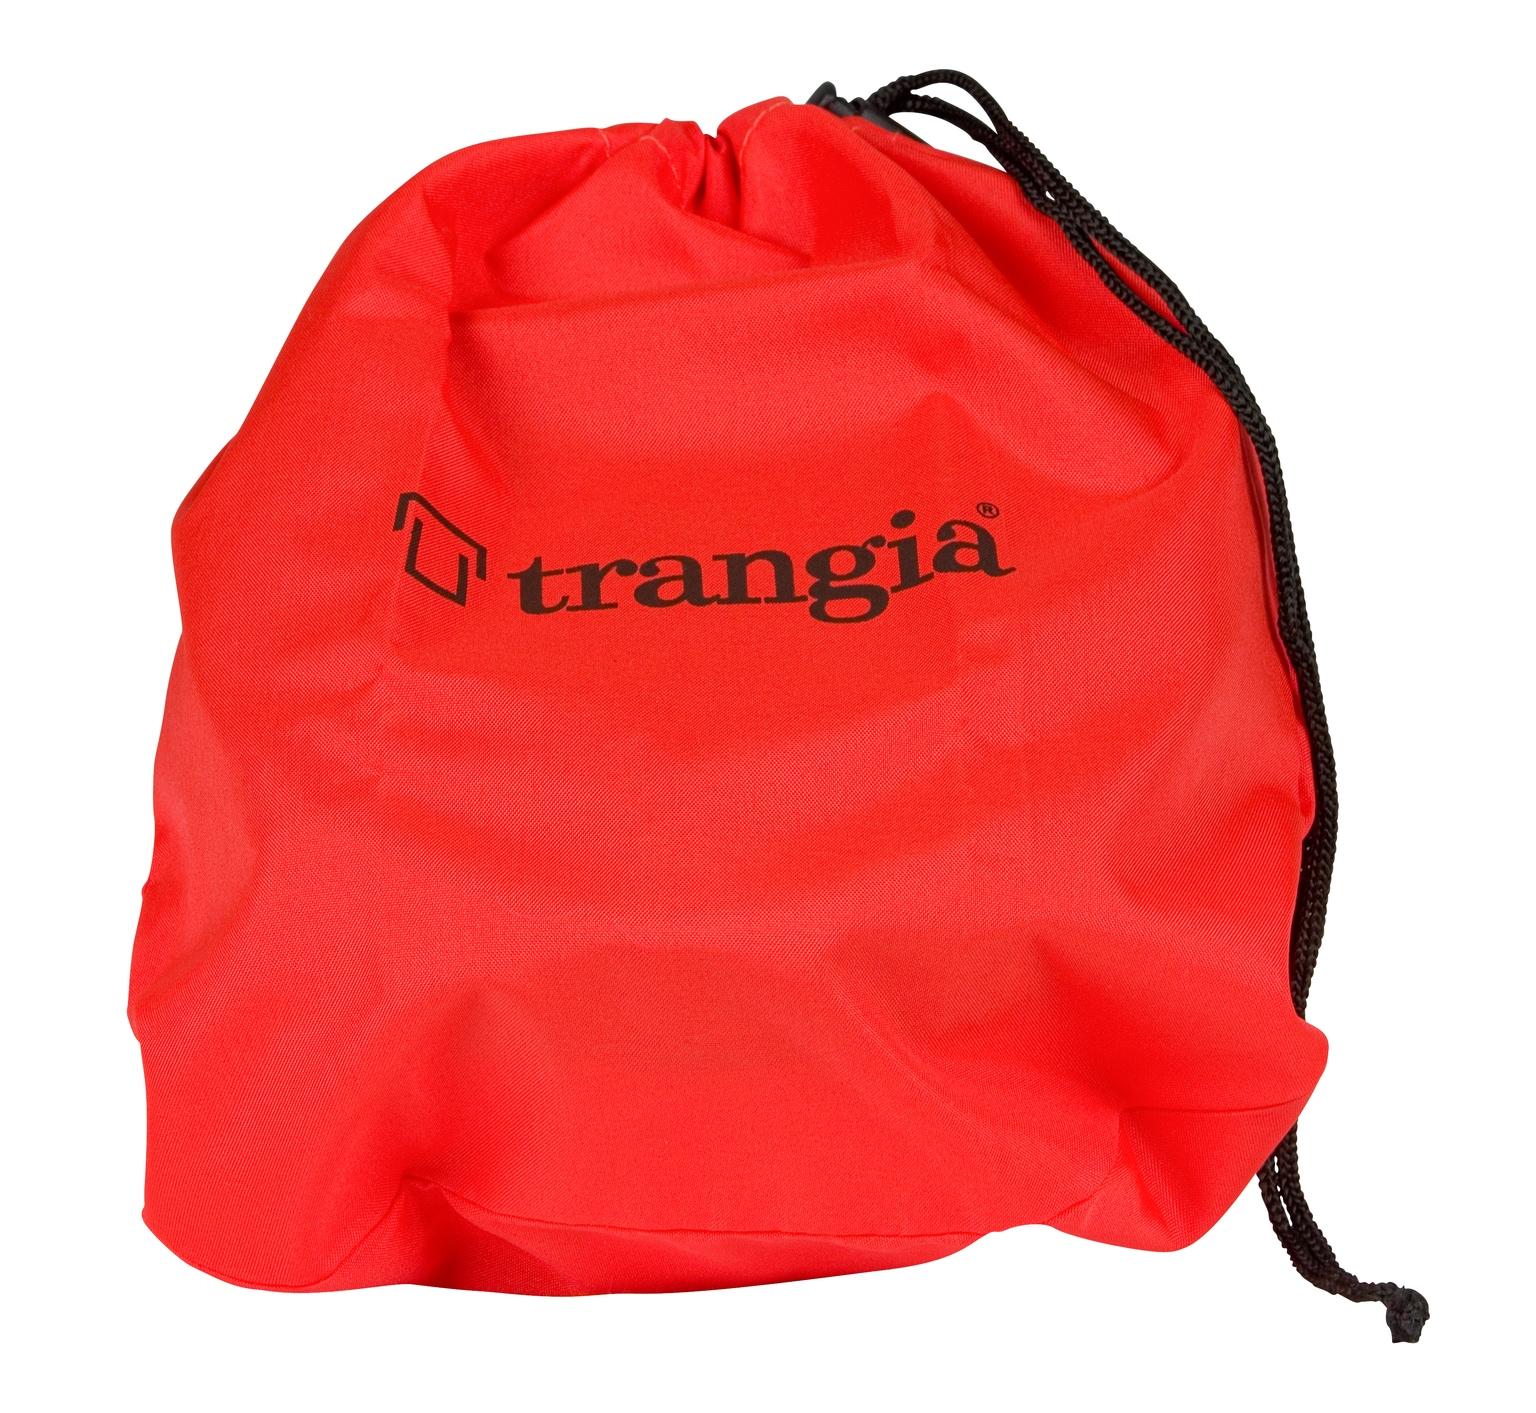 Trangia Overtrekkspose for 27-serien